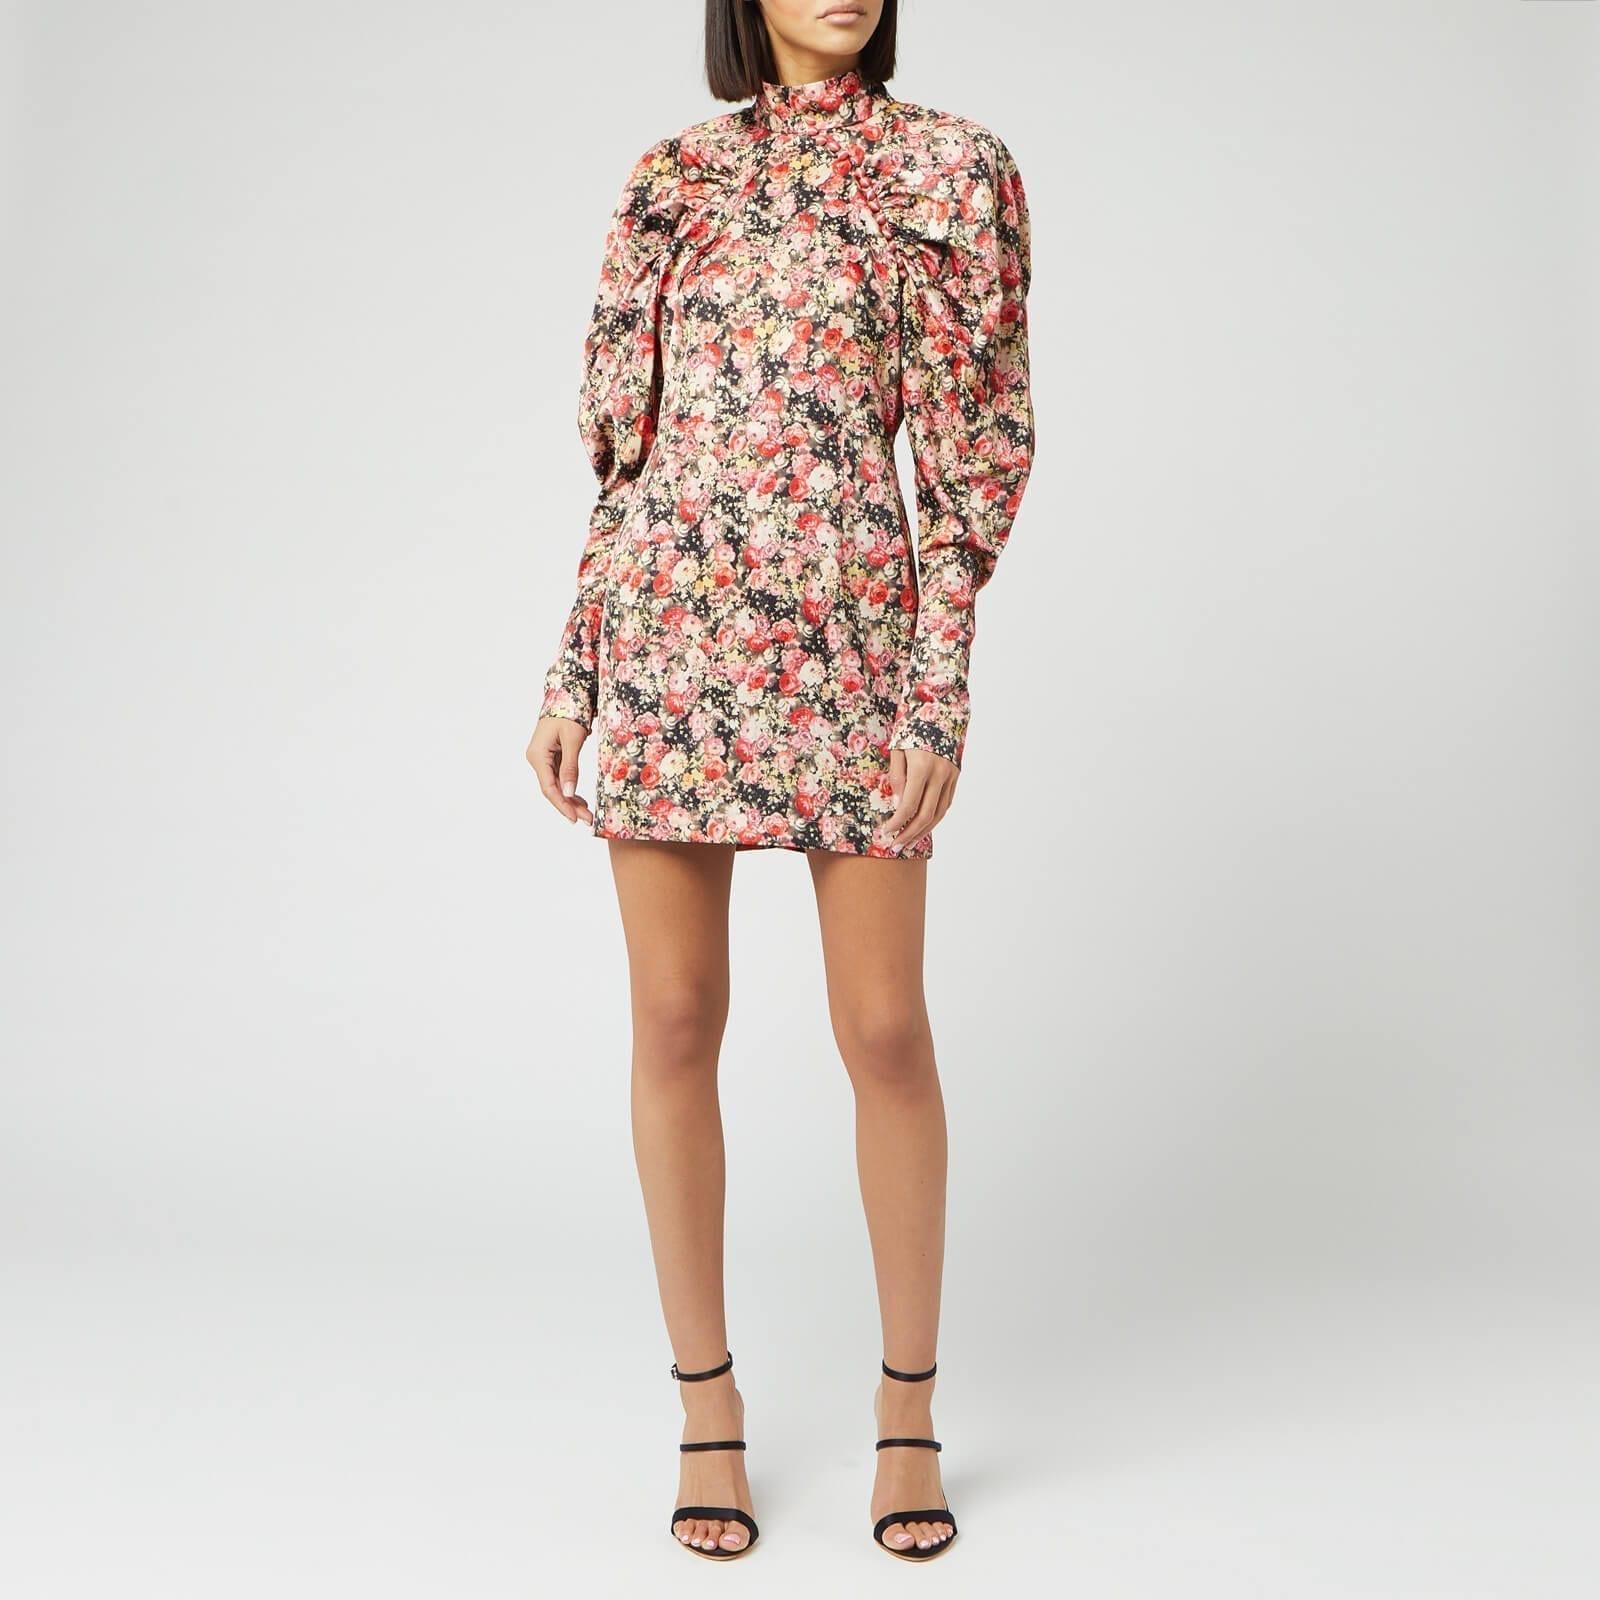 ROTATE BIRGER CHRISTENSEN Women's Kim Floral Mini Dress